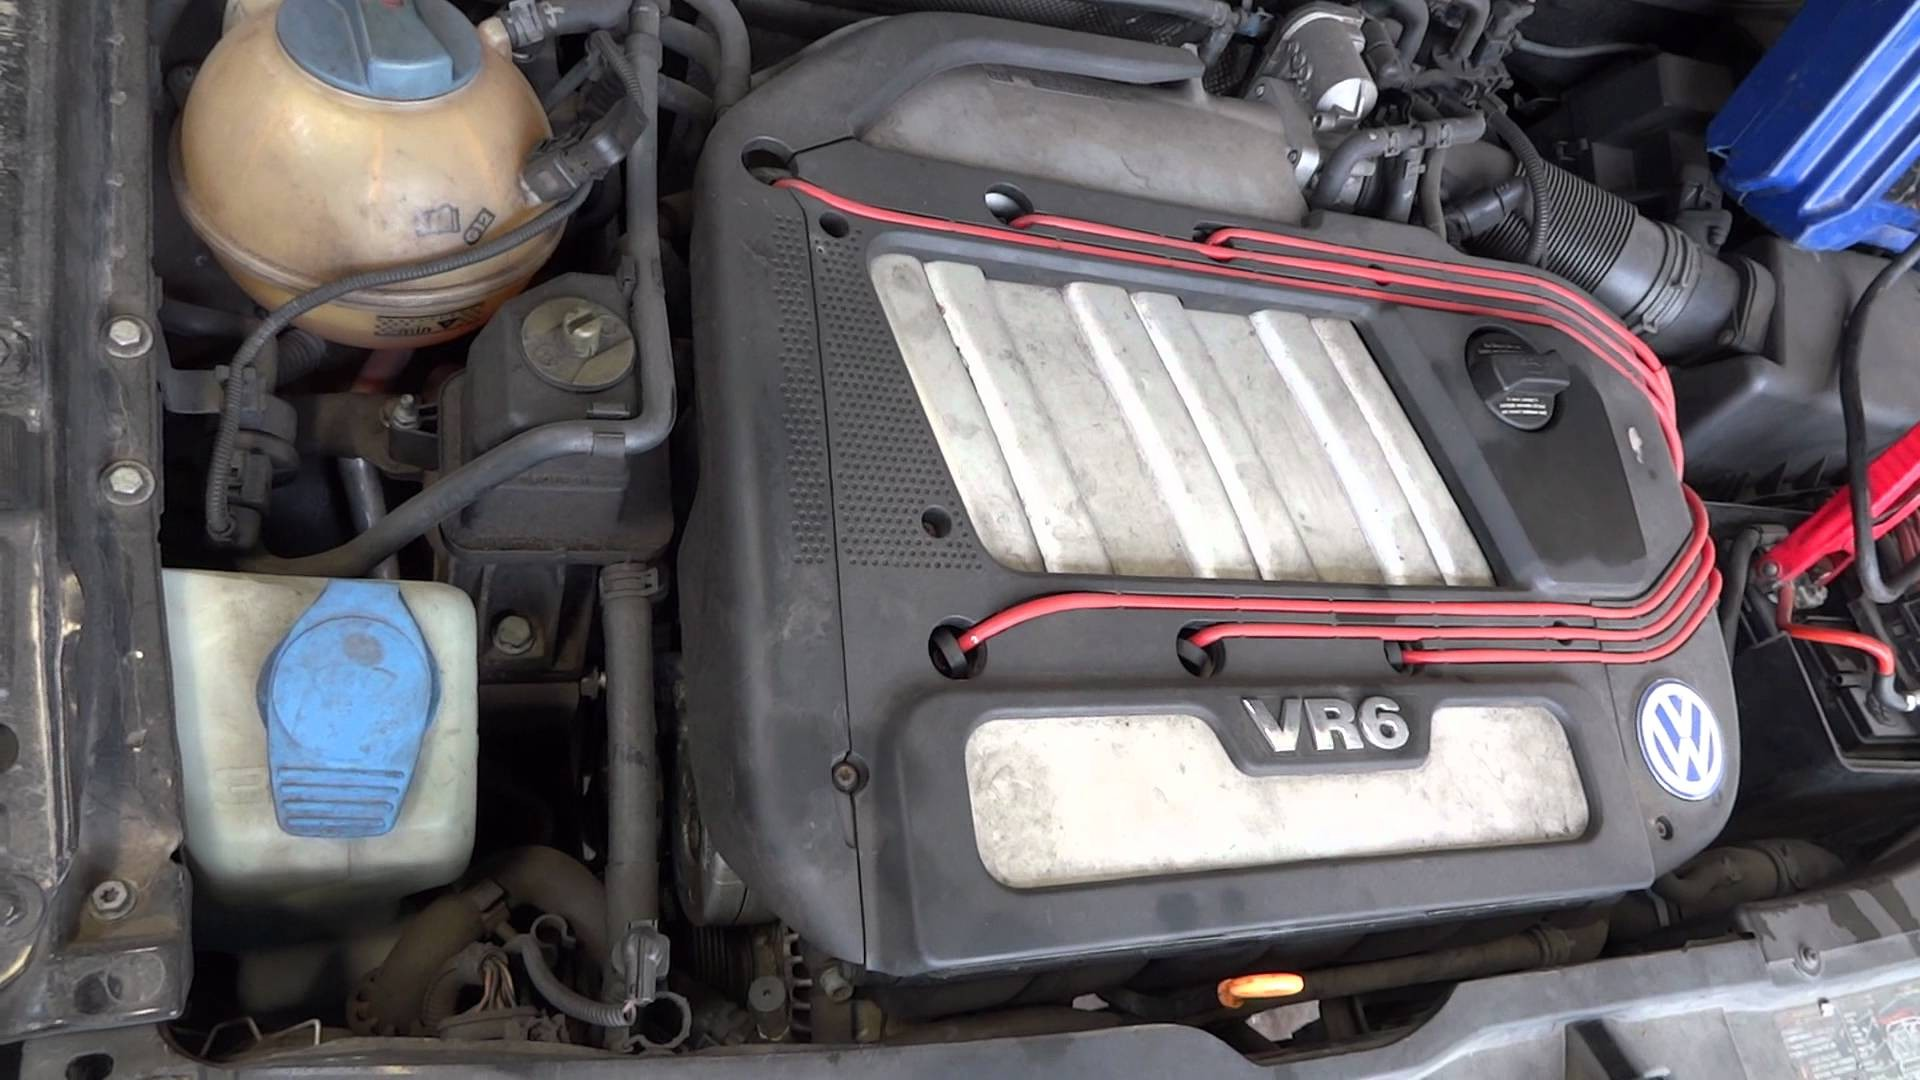 2001 jetta vr6 vacuum diagram wiring for jvc radio 2 8l engine best site harness